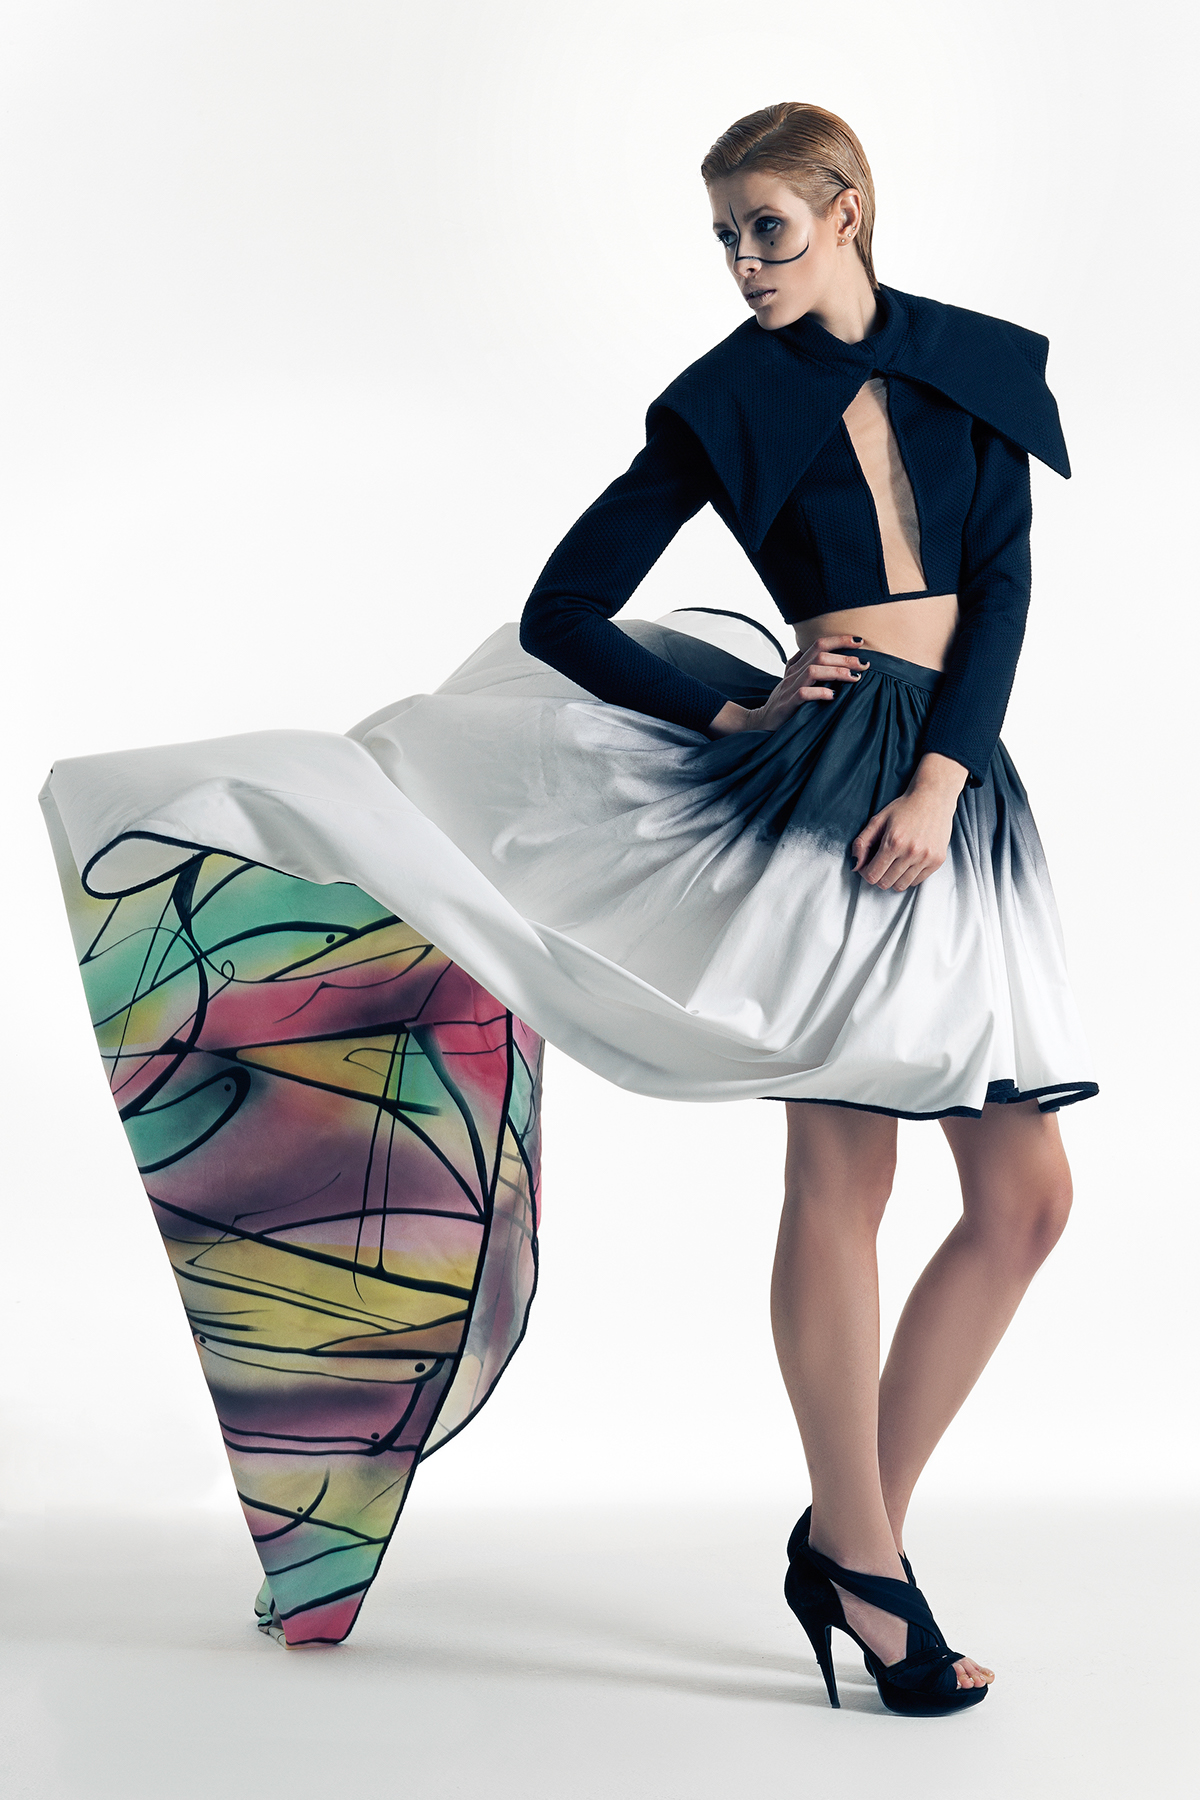 Fashion merchandising product development 27